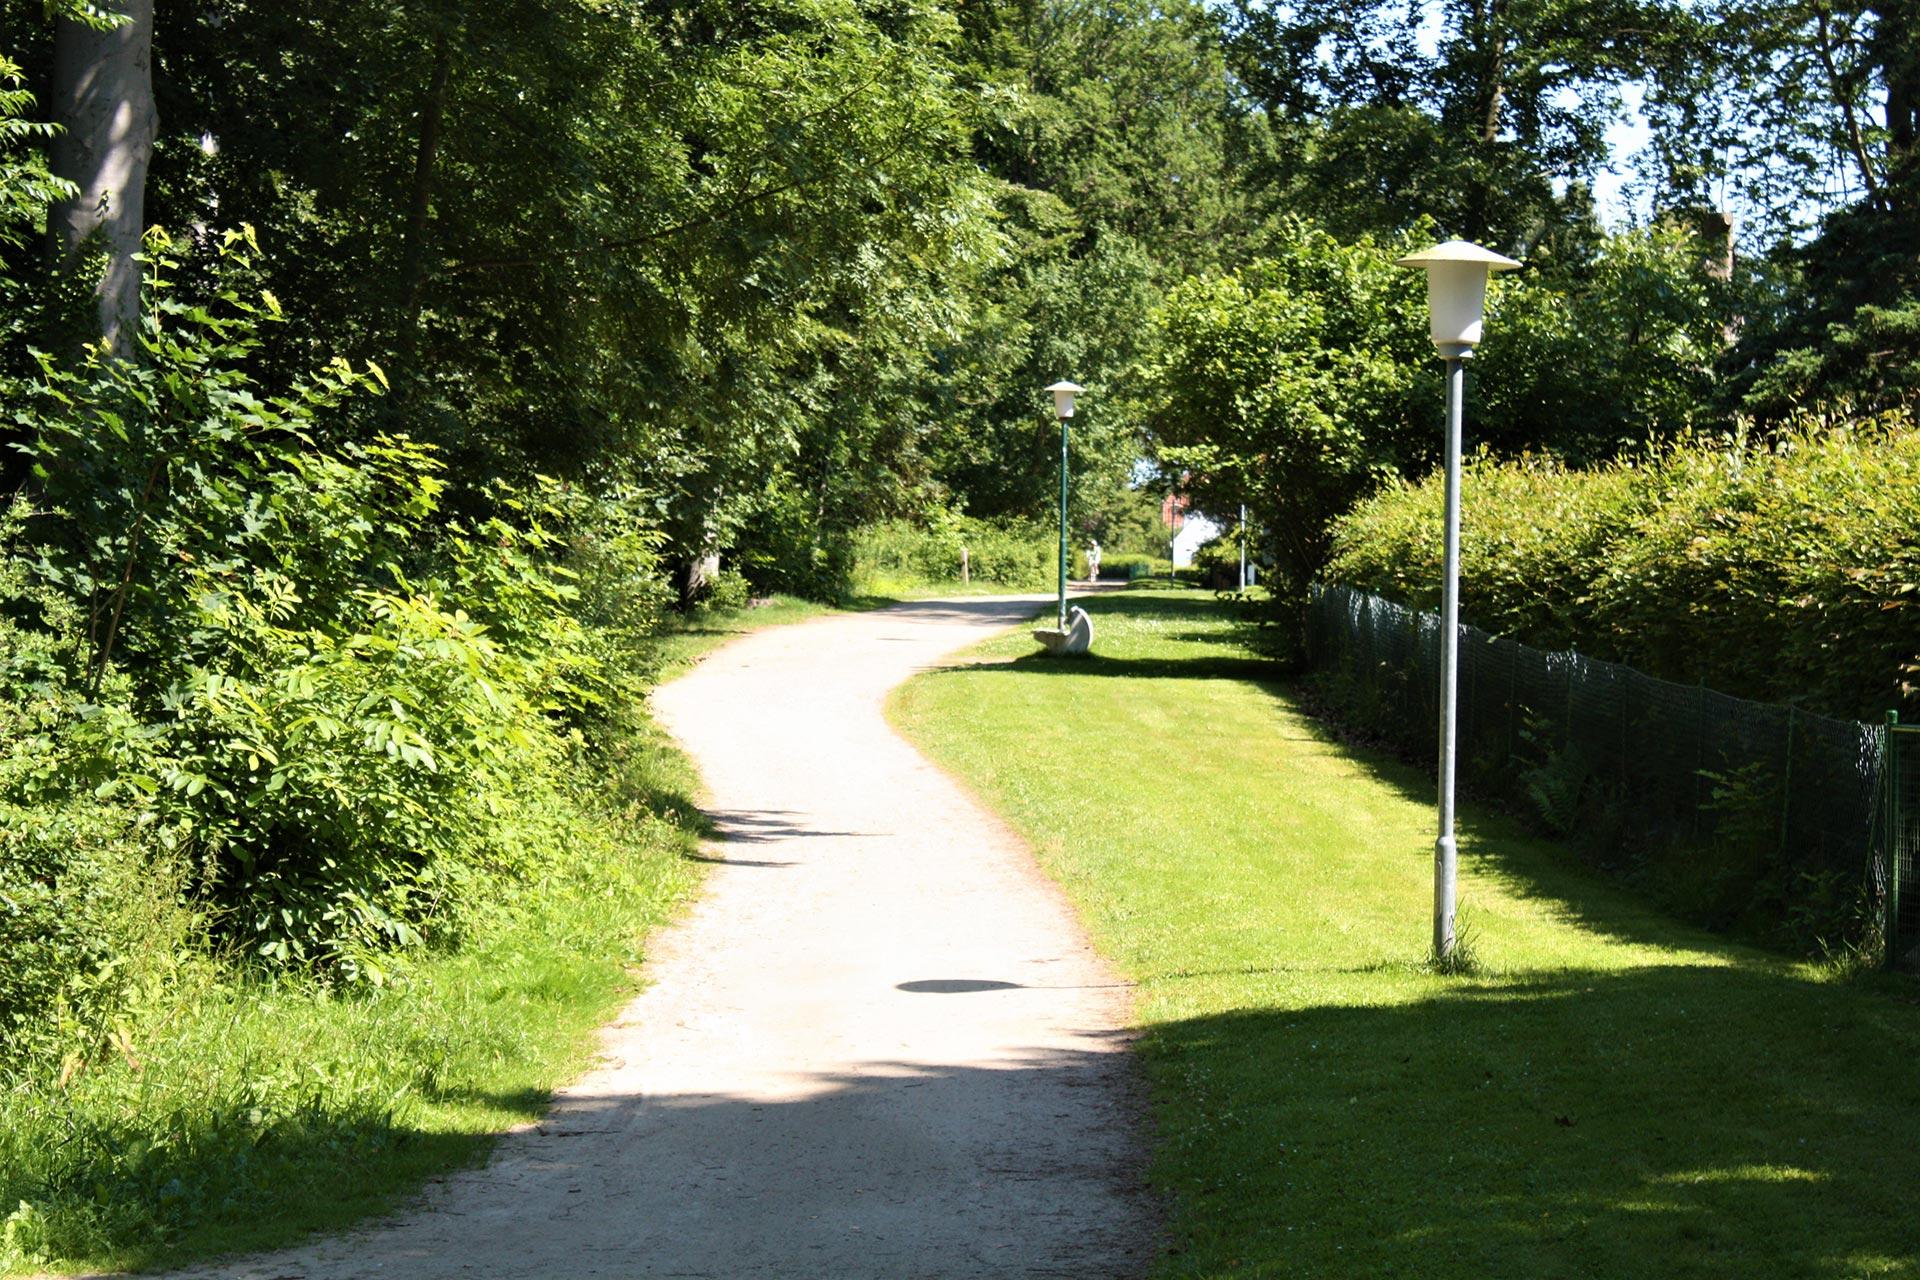 malerhaus-kuhse-spazier-und-wanderwege-04